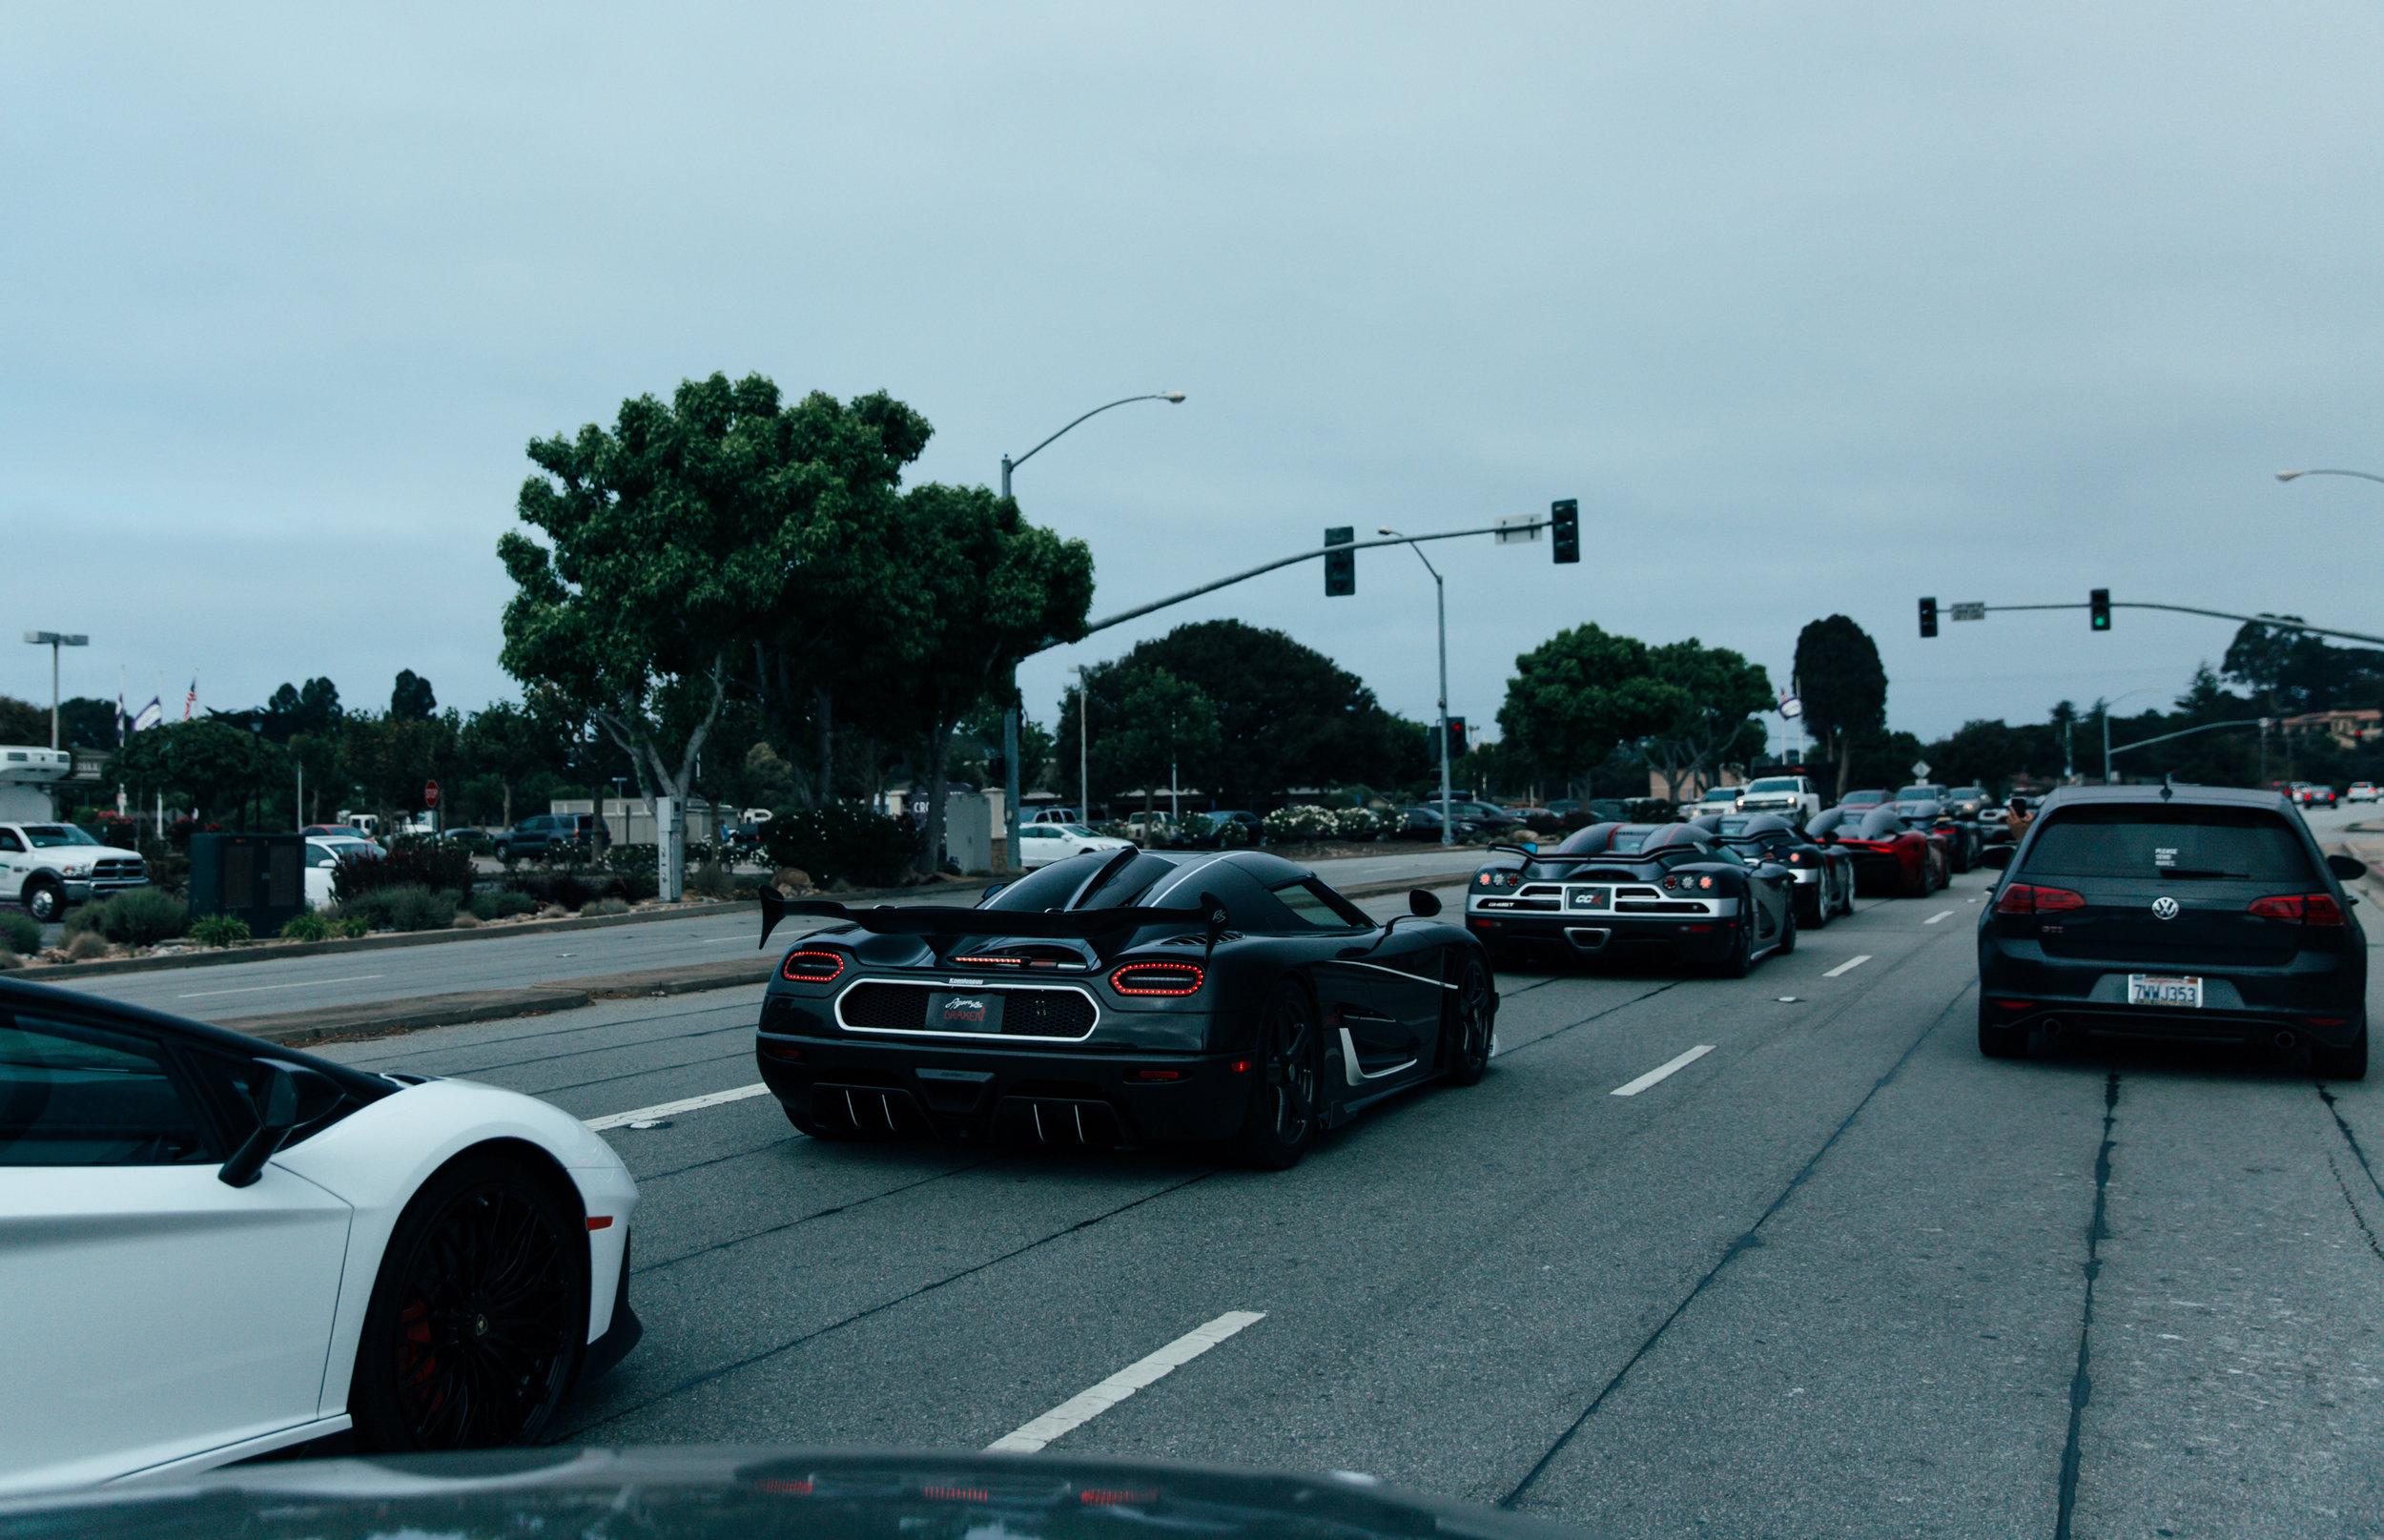 Stay_Driven_Monterey_Car_Week_Koenigsegg-21.jpg